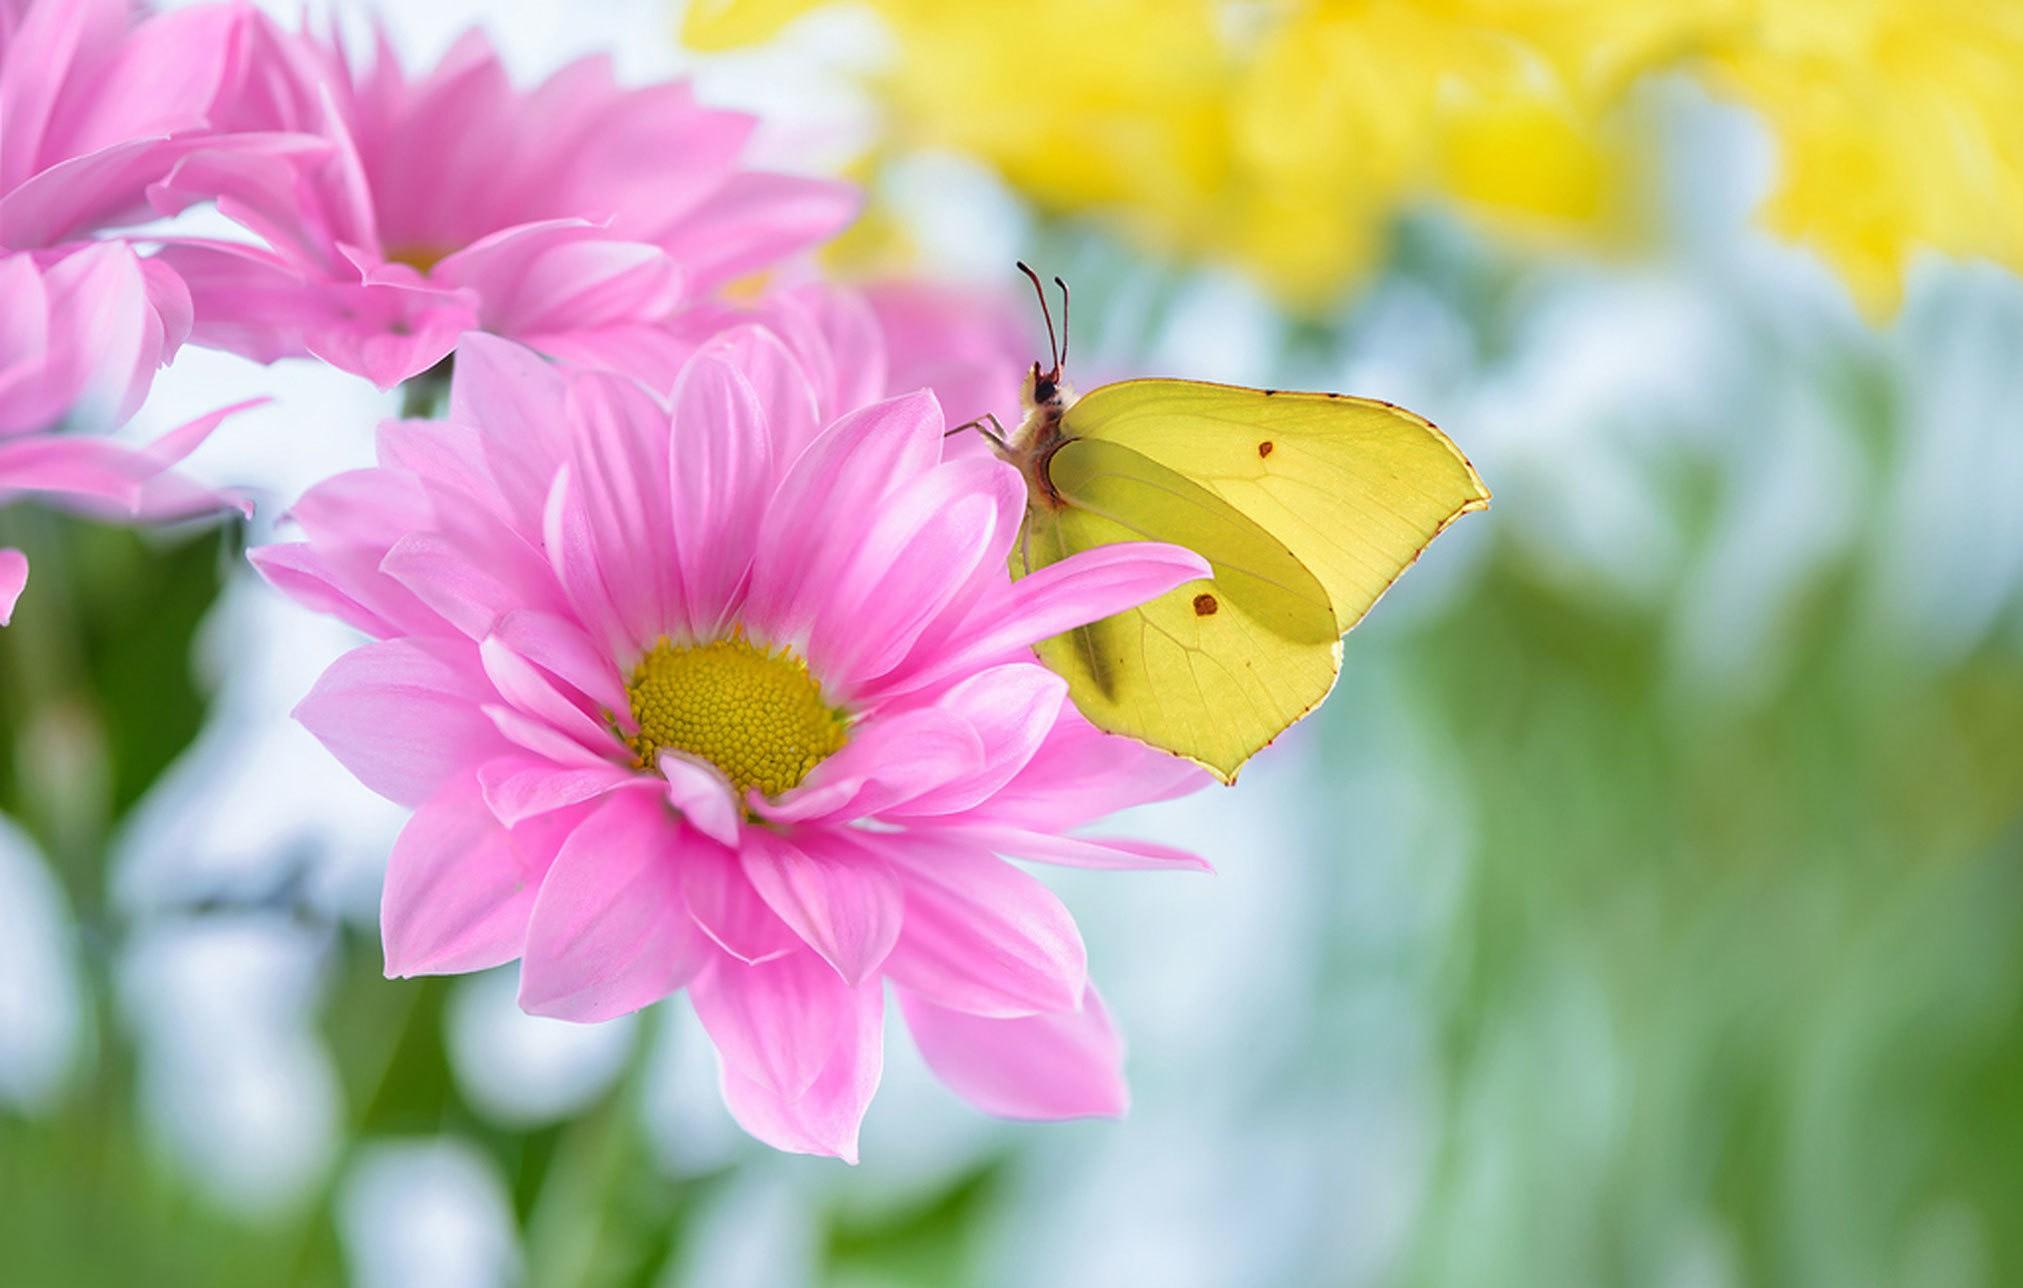 Лето картинки цветы бабочки, своими руками февраля